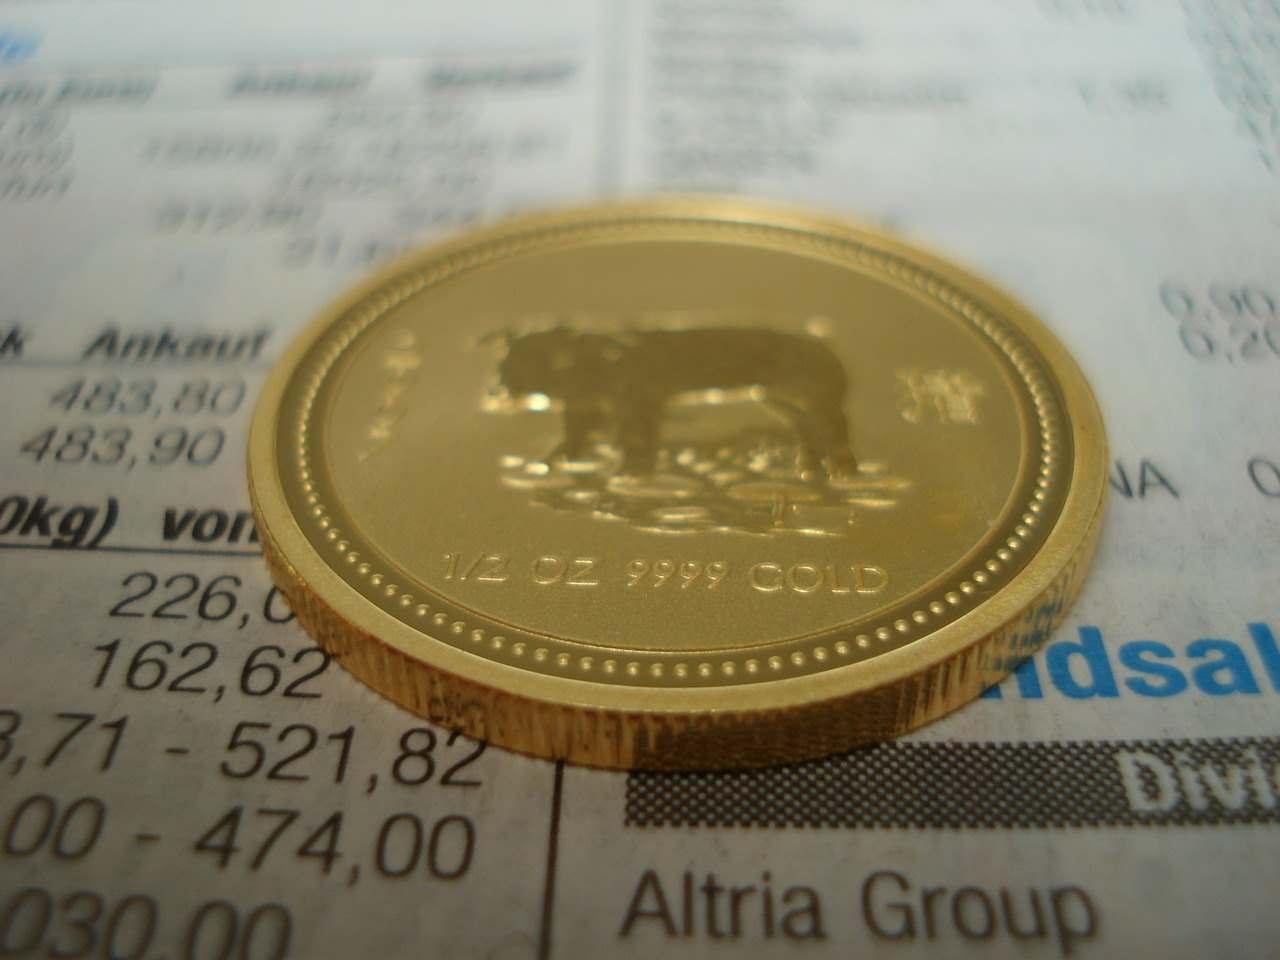 Russland-News-247.de - Russland Infos & Russland Tipps | Euro-Parität zum US-Dollar bald Wirklichkeit? (Nachweis: pixabay.com)